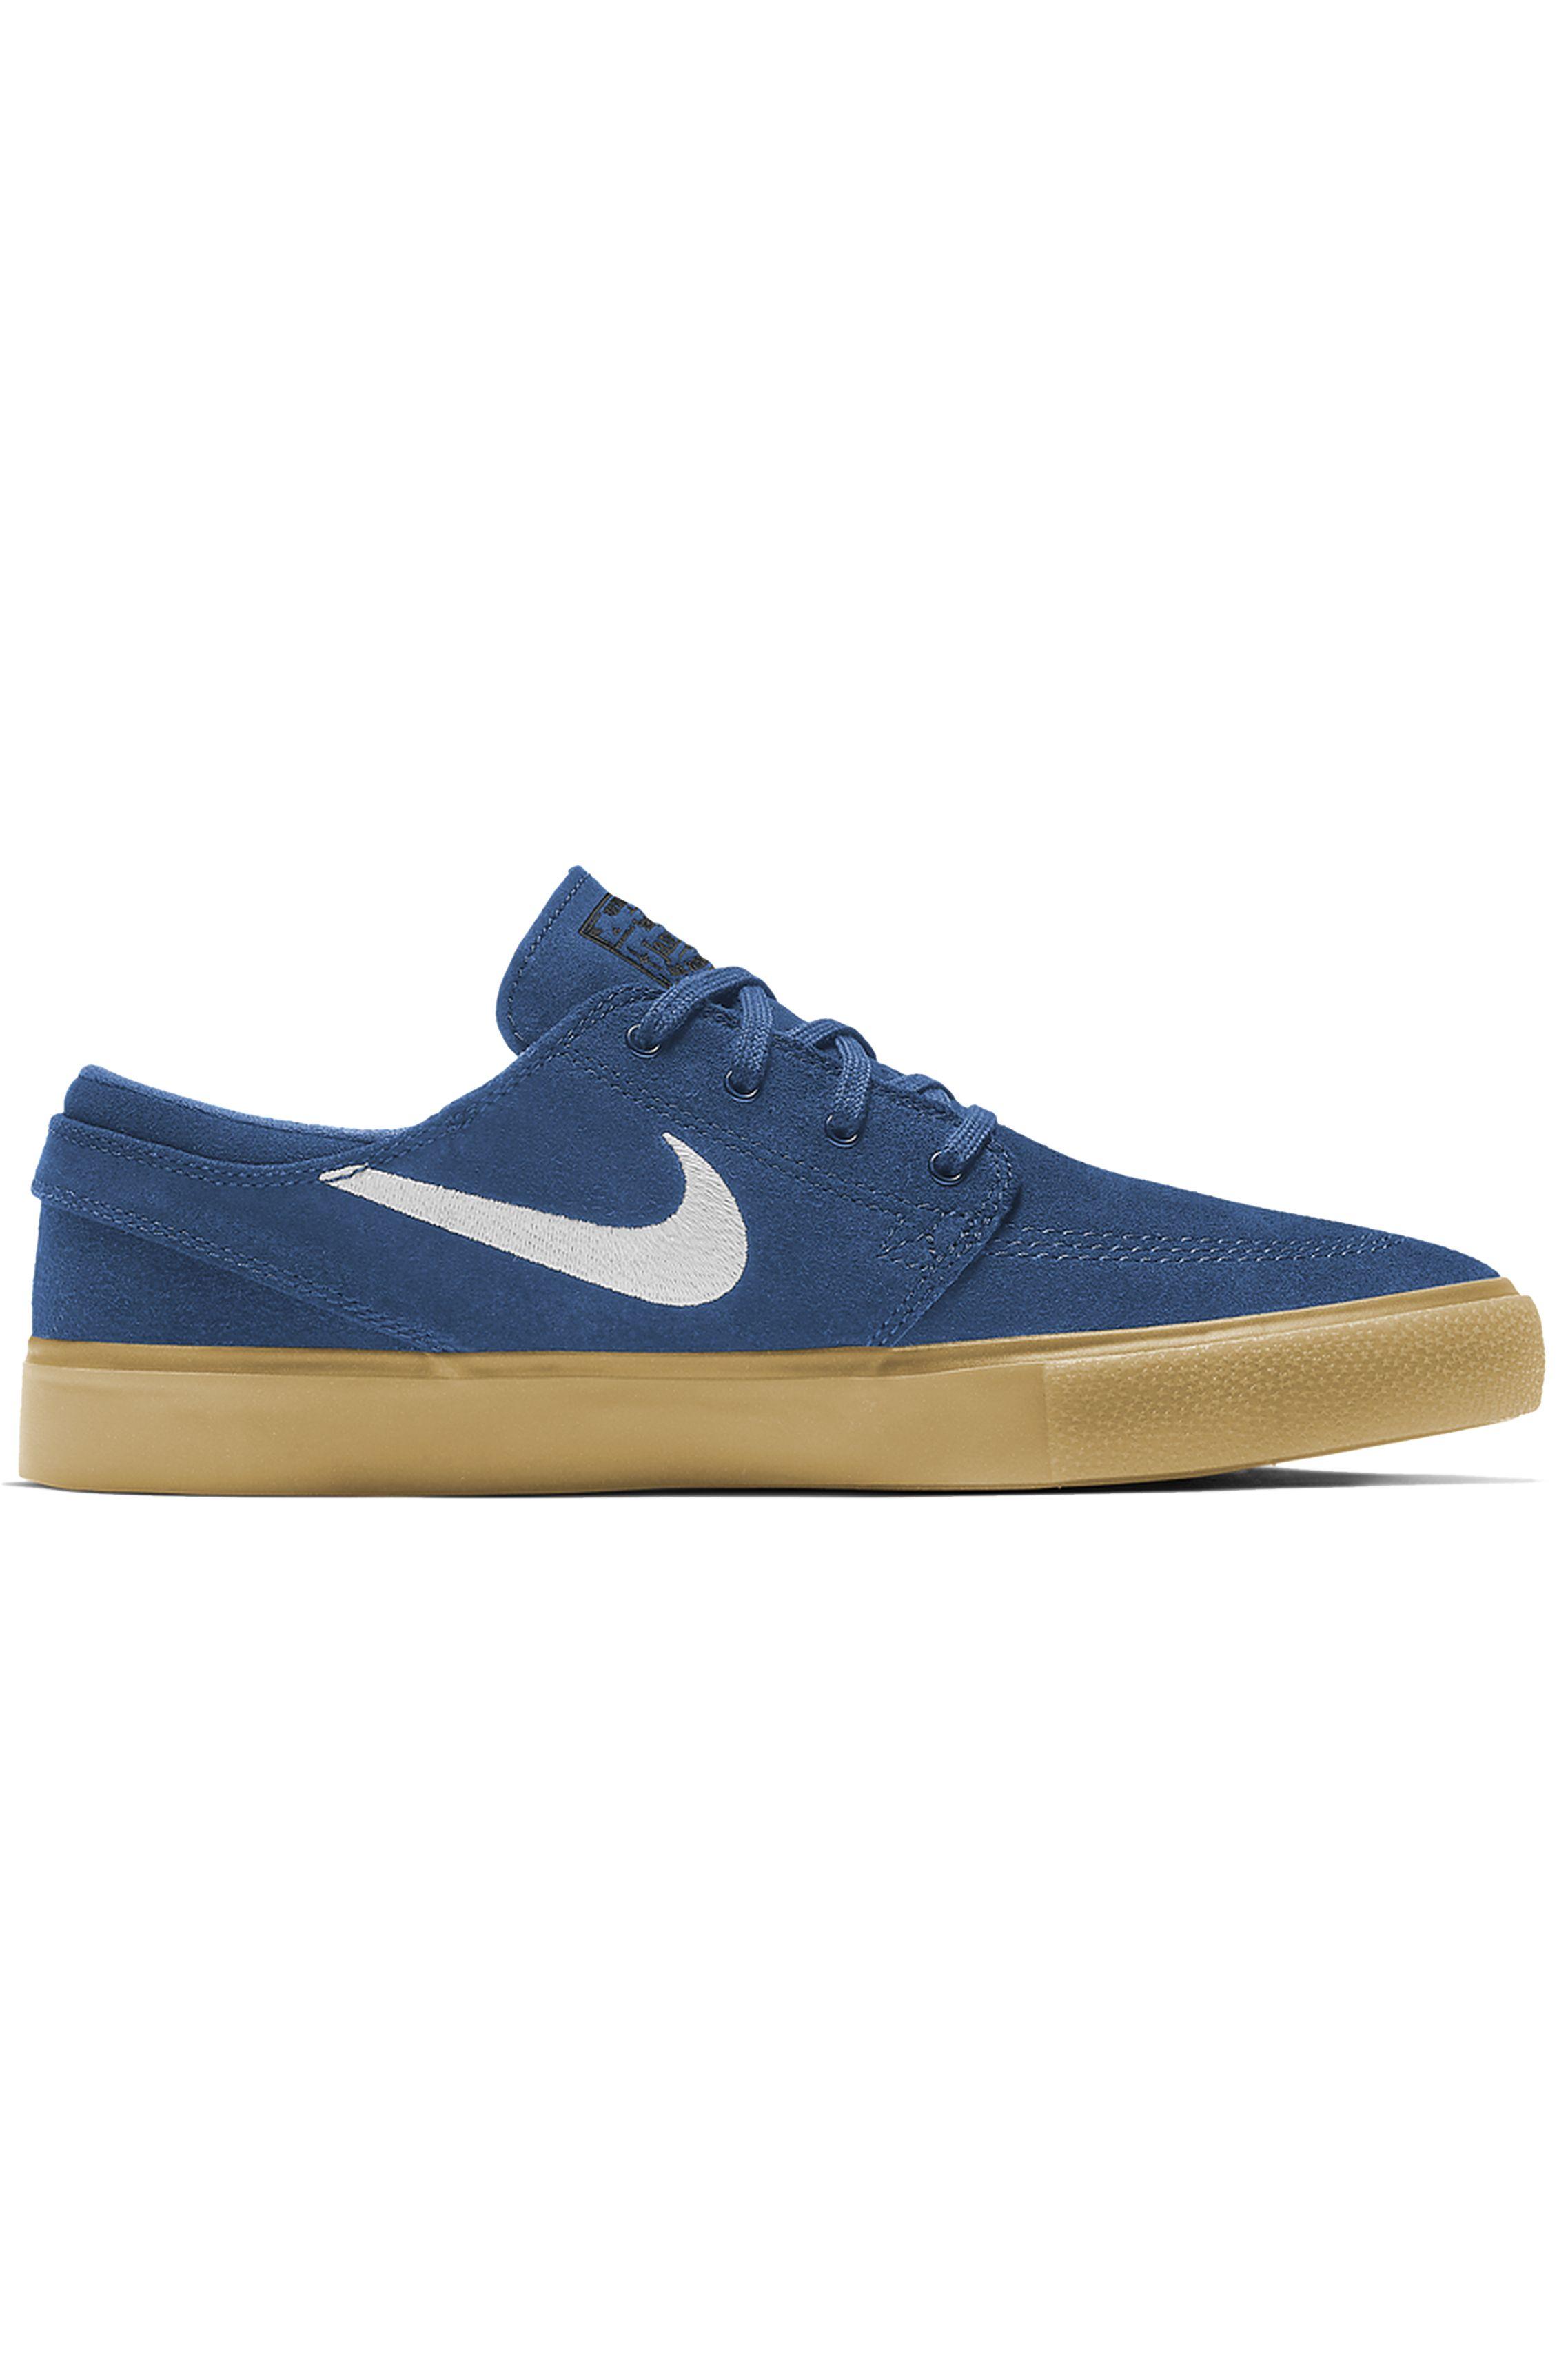 Nike Sb Shoes ZOOM STEFAN JANOSKI RM Court Blue/White-Court Blue